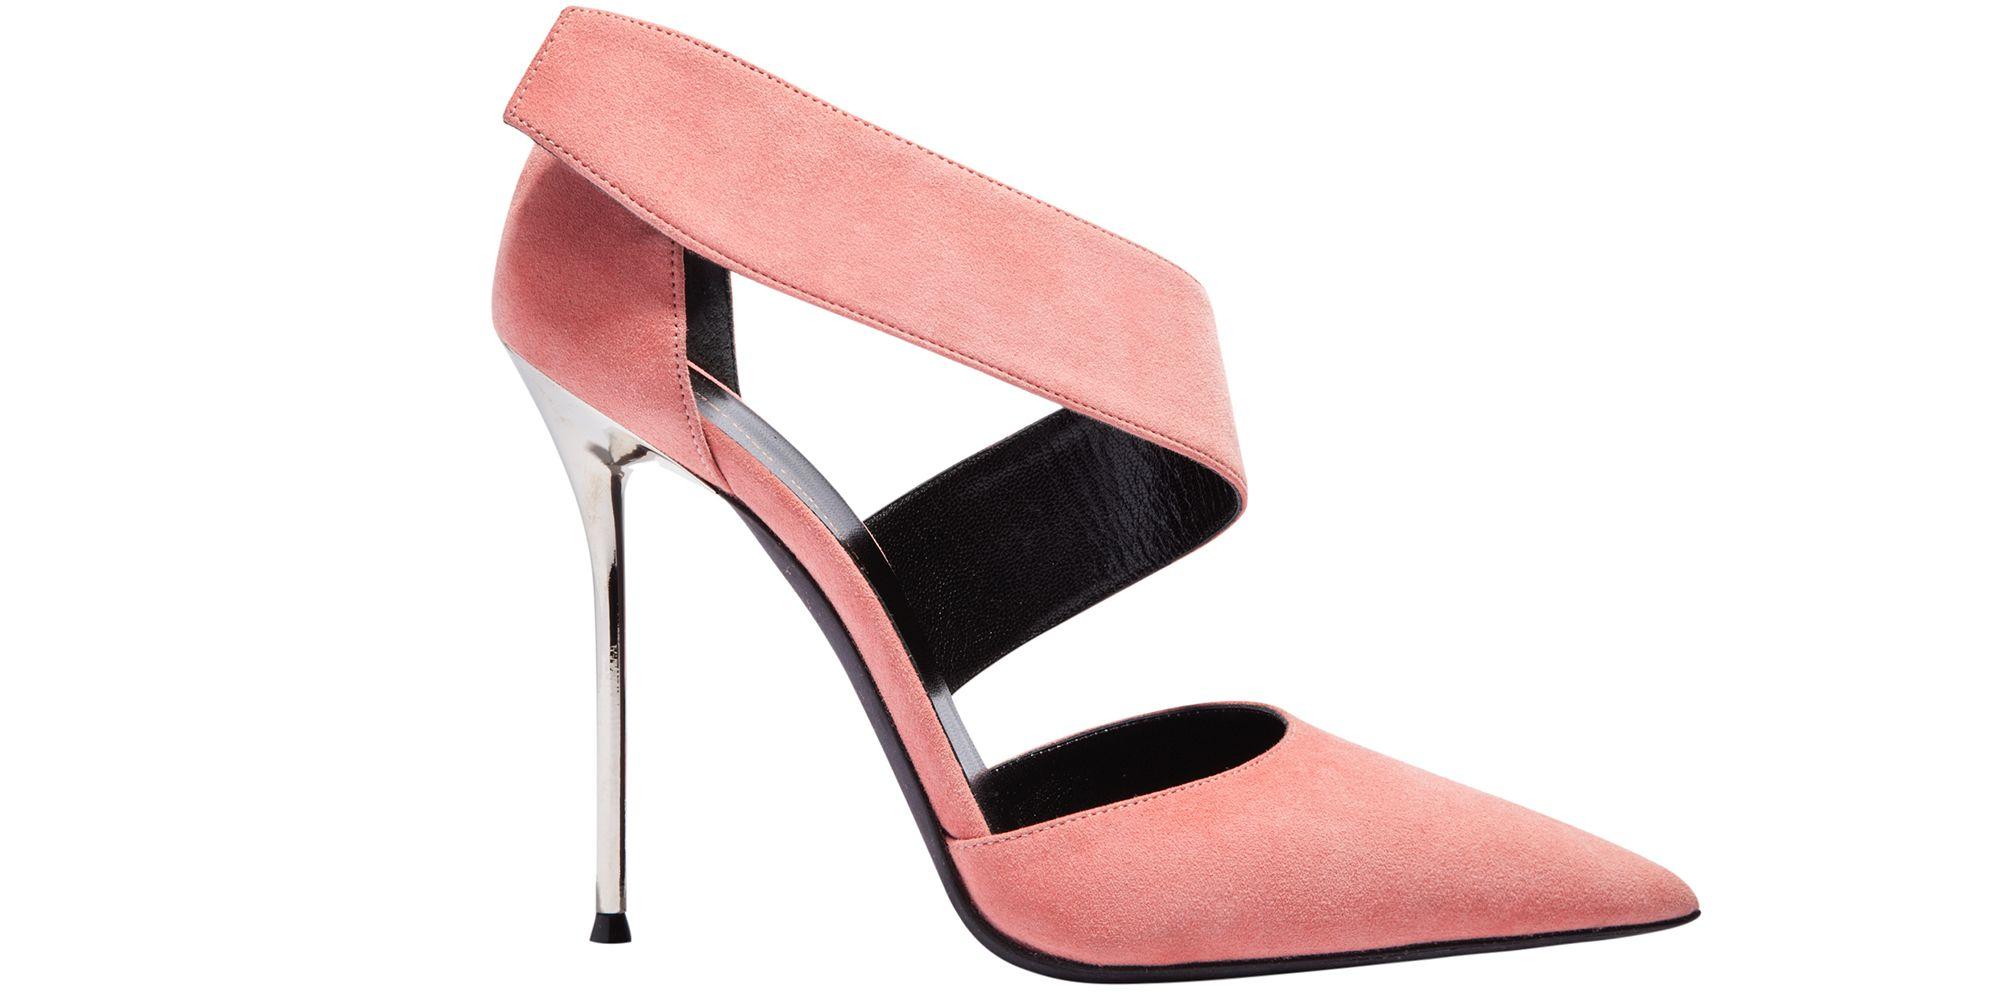 <p><strong>Narciso Rodriguez </strong>shoes, $795, Barneys New York, 888-8-BARNEYS.</p>